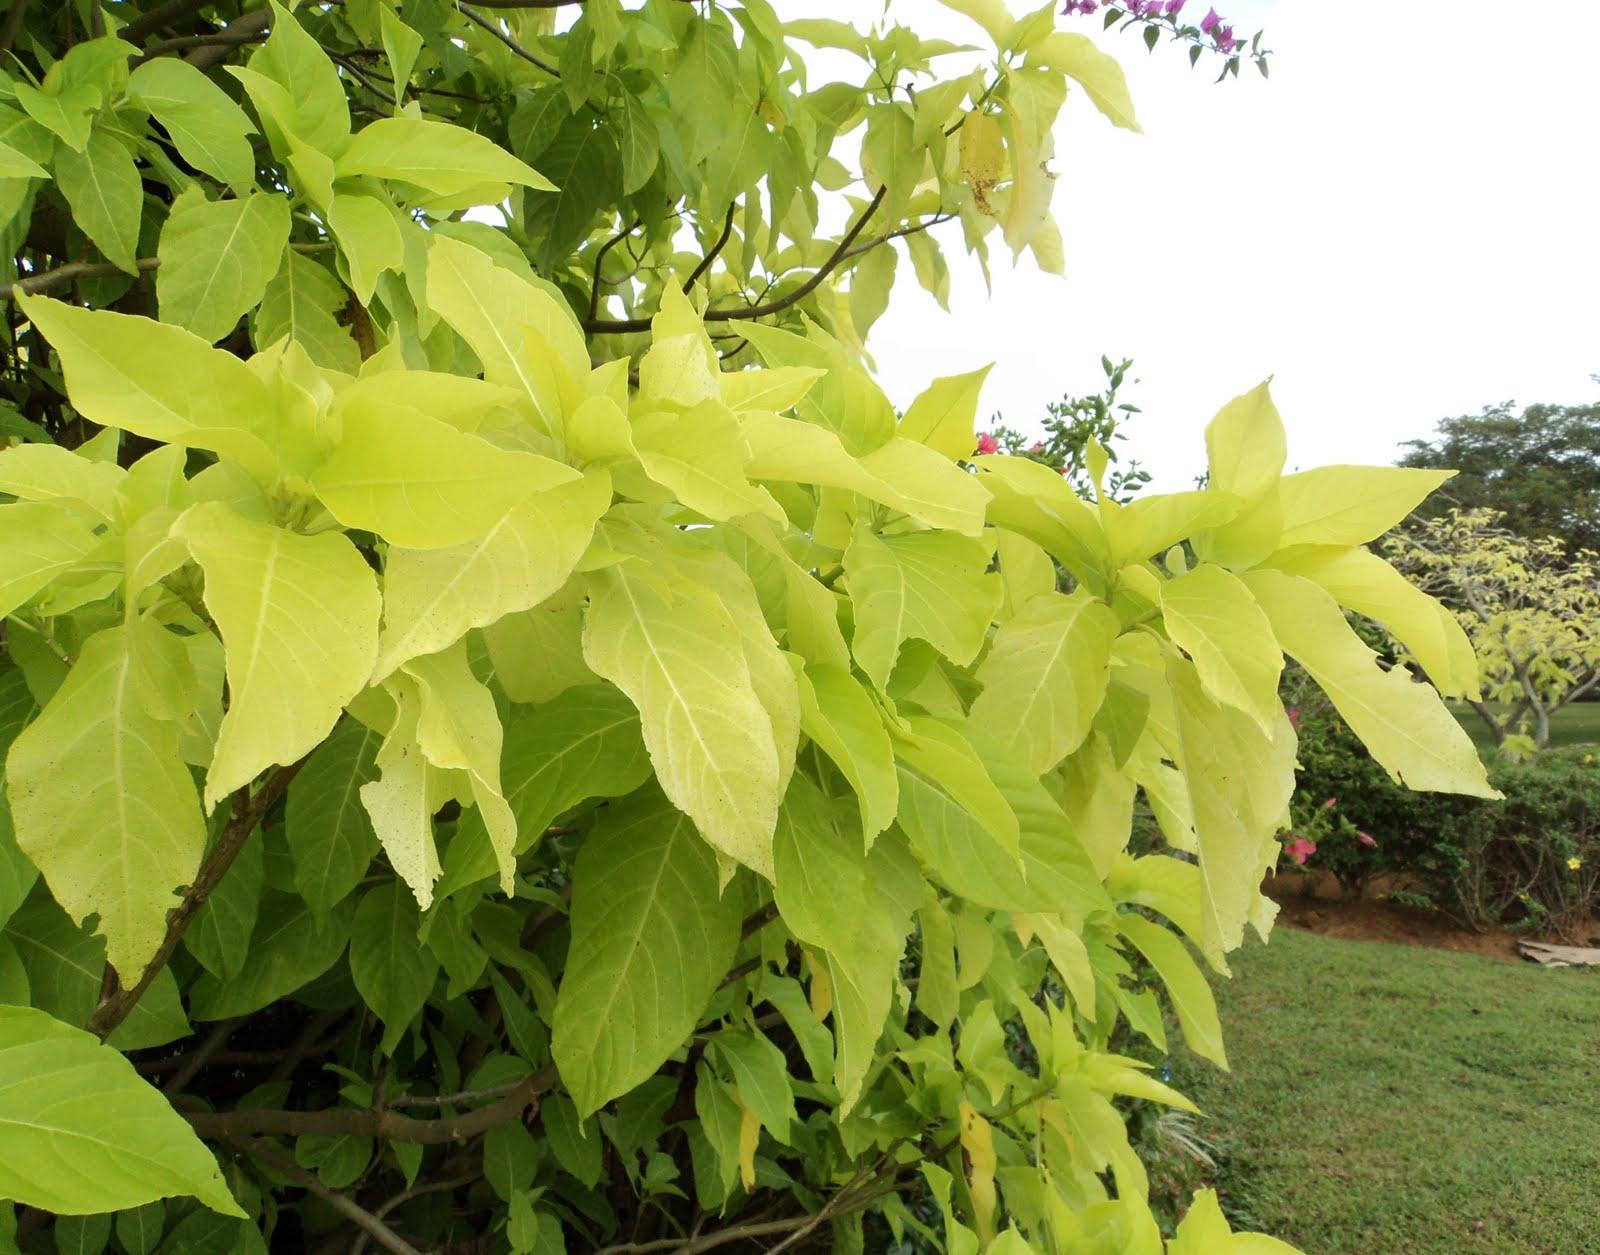 Vriksha Nursery 20 Plants That Survive At The Mumbai Sea Face